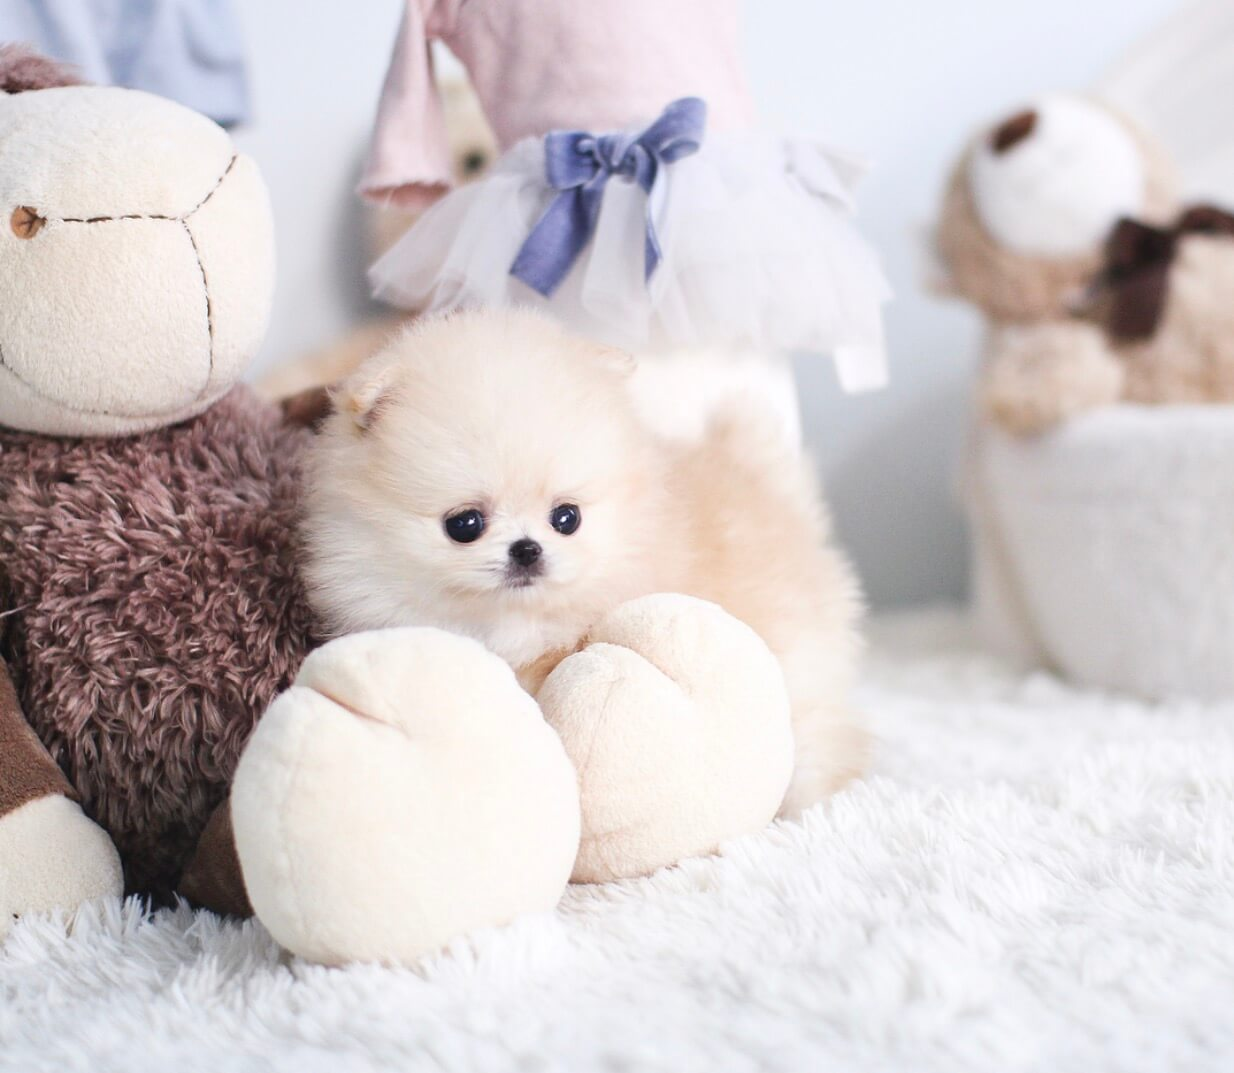 Pandora Cream Hair Small Pomeranian Puppies for Sale - MICROTEACUPS